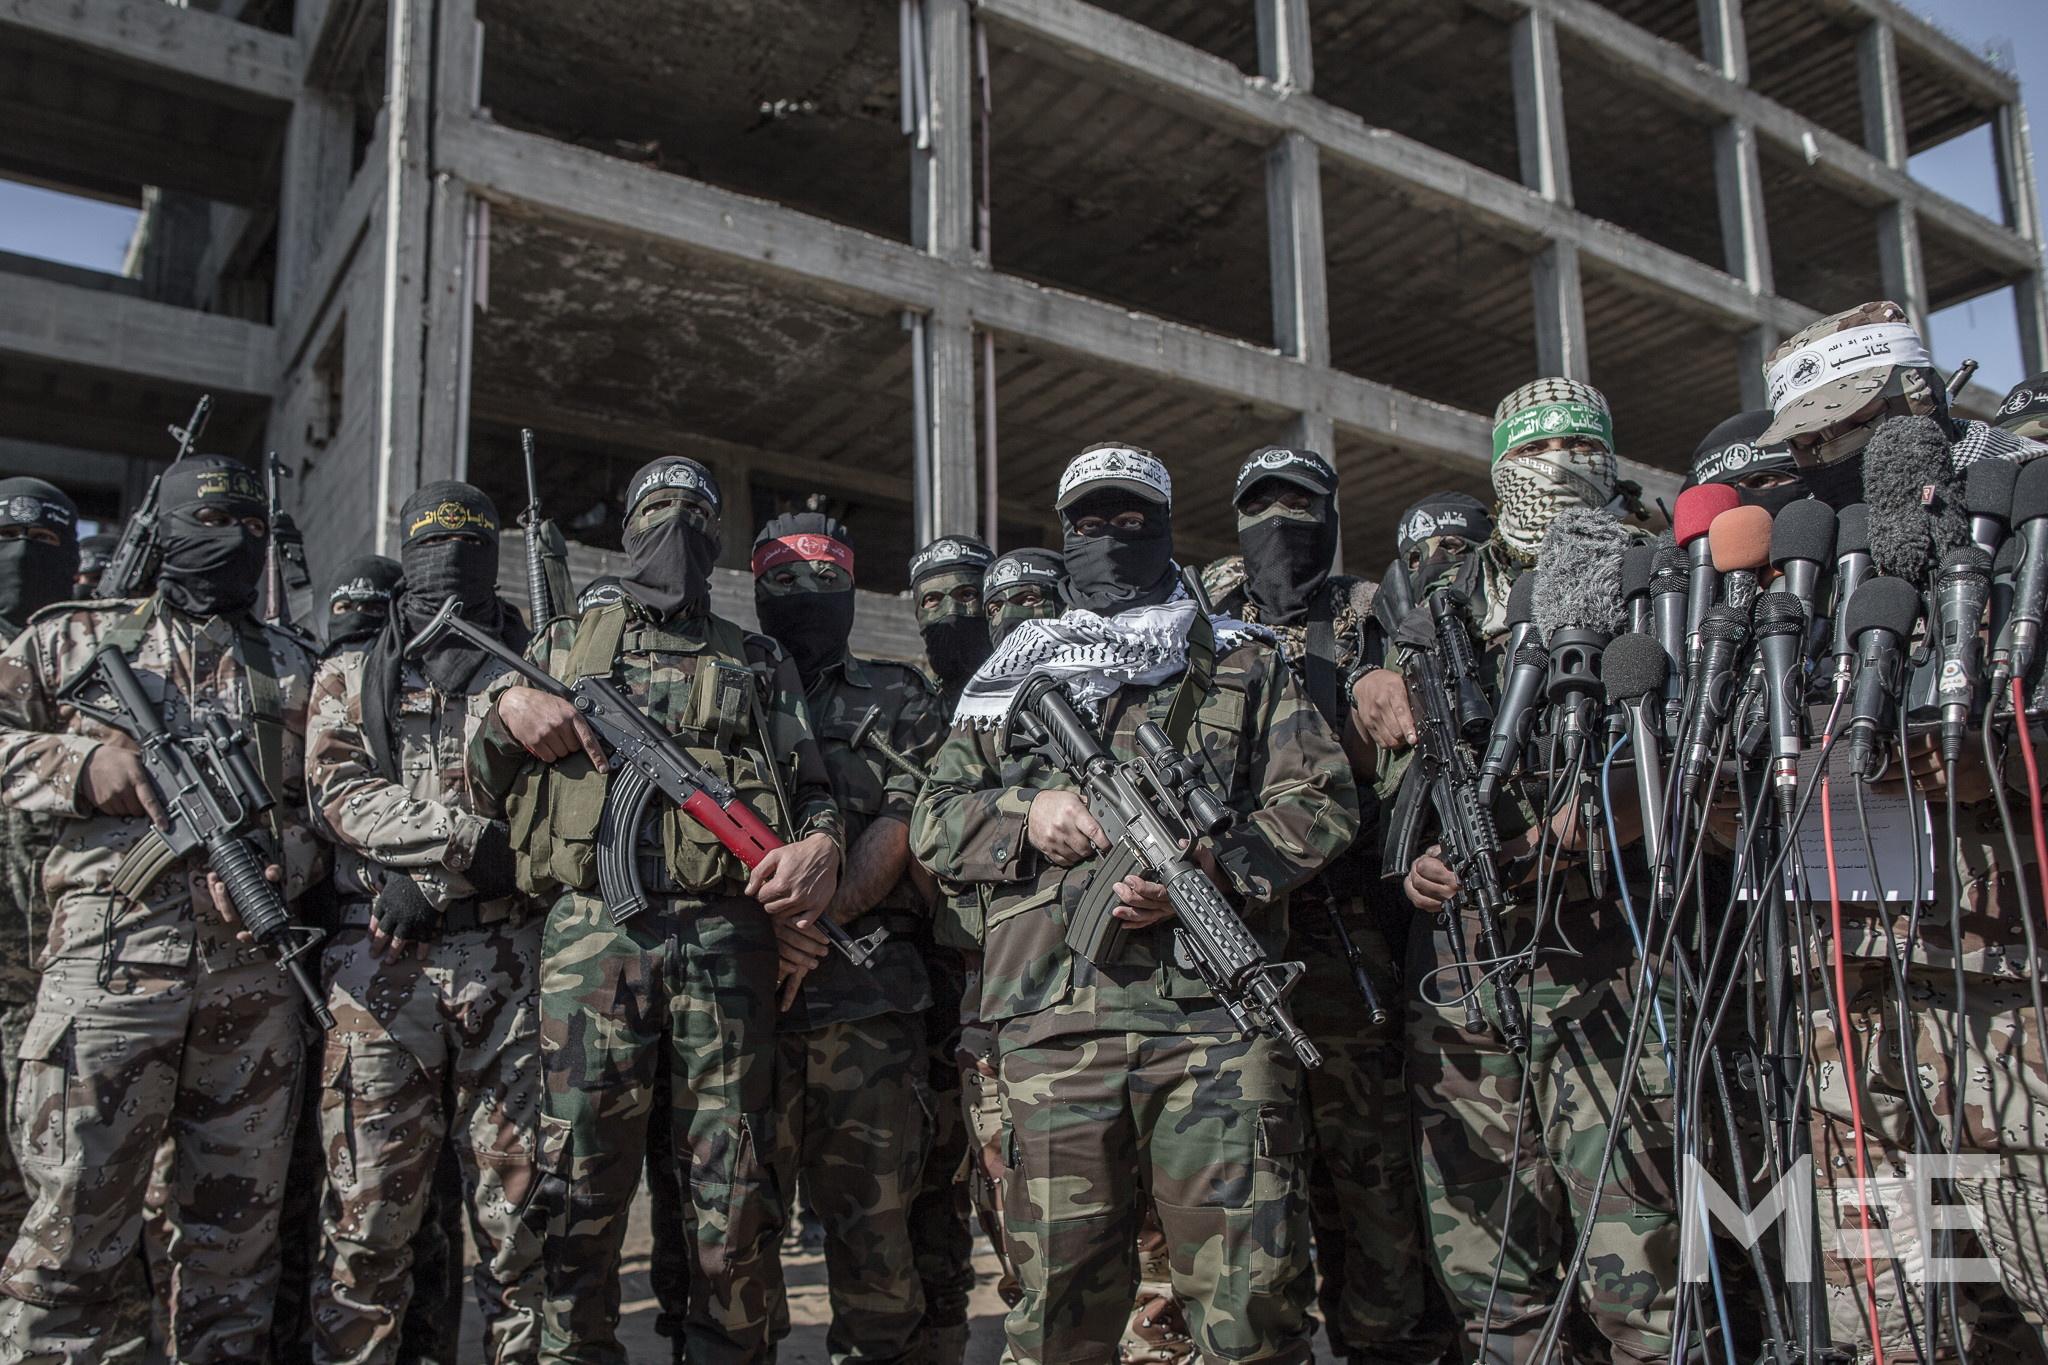 Gaza ruling group hamas